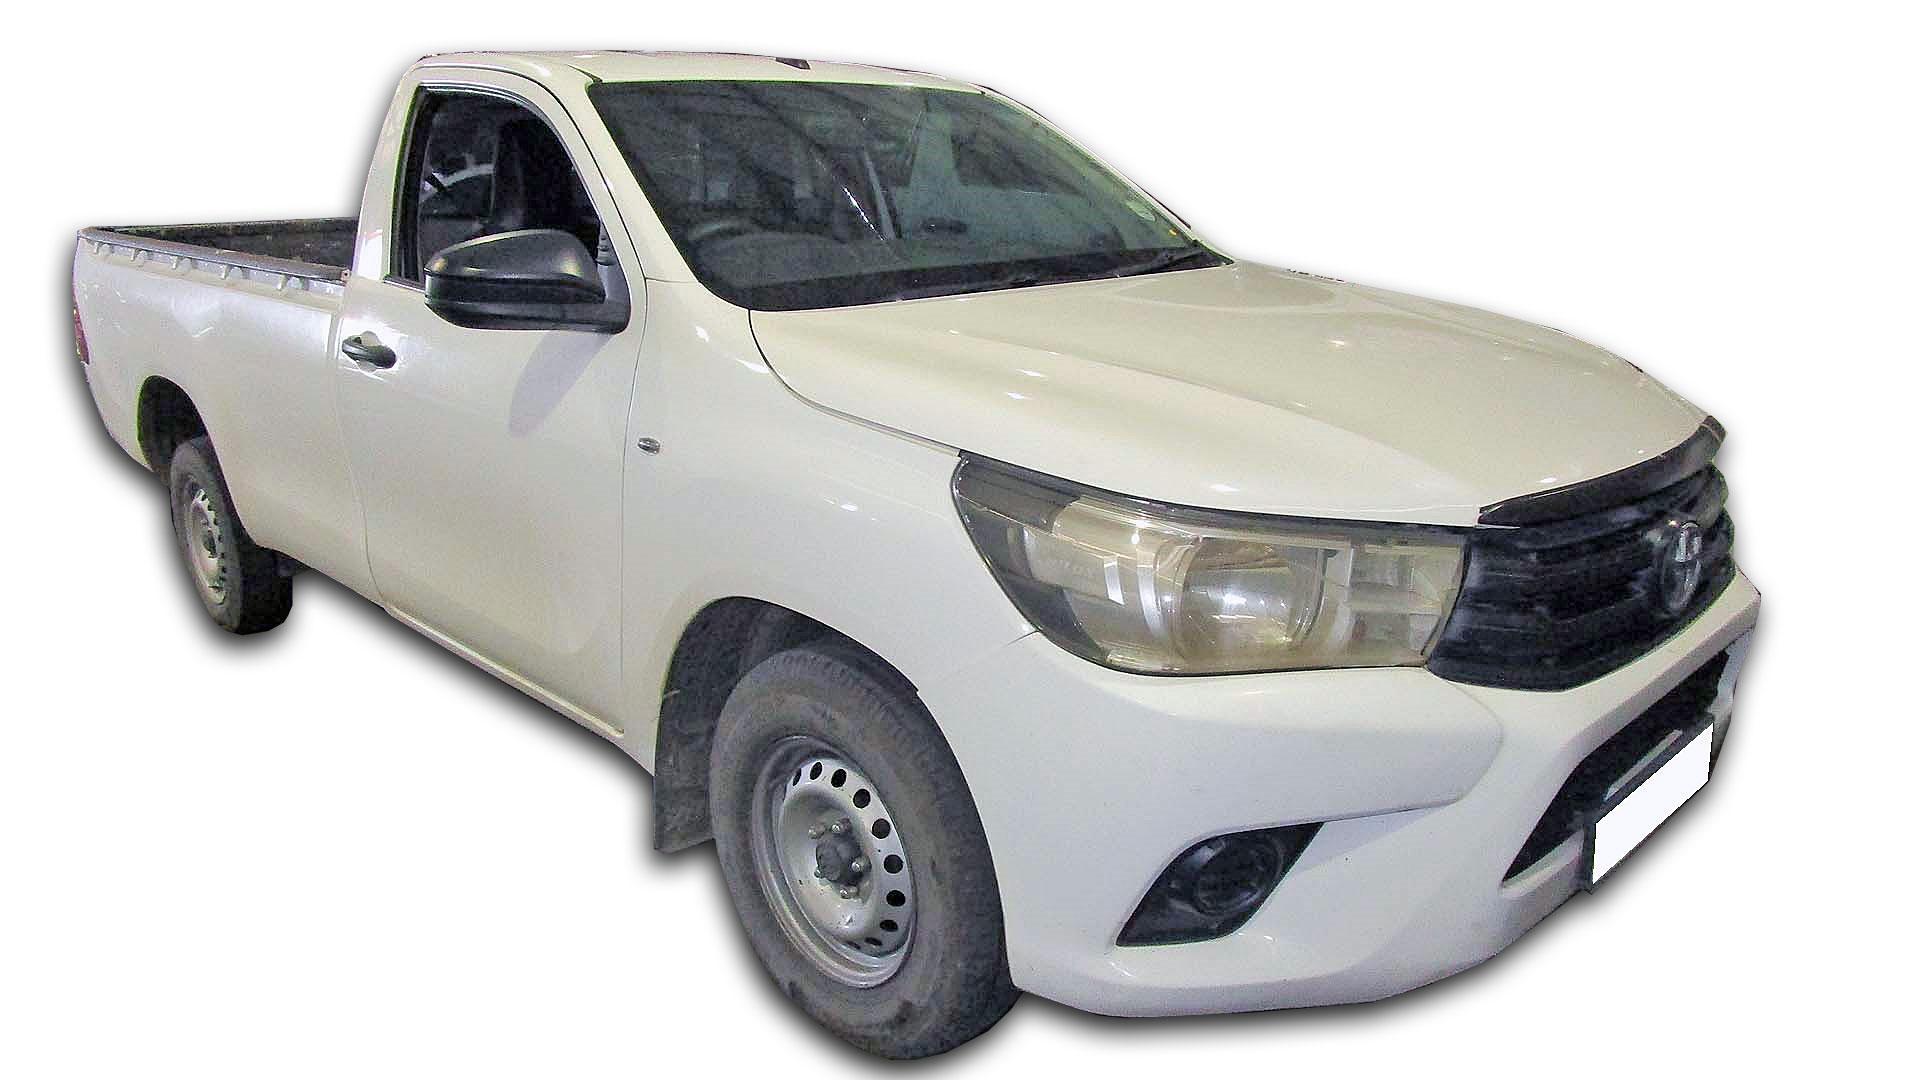 Toyota Hilux 2.4 GD P/U S/C